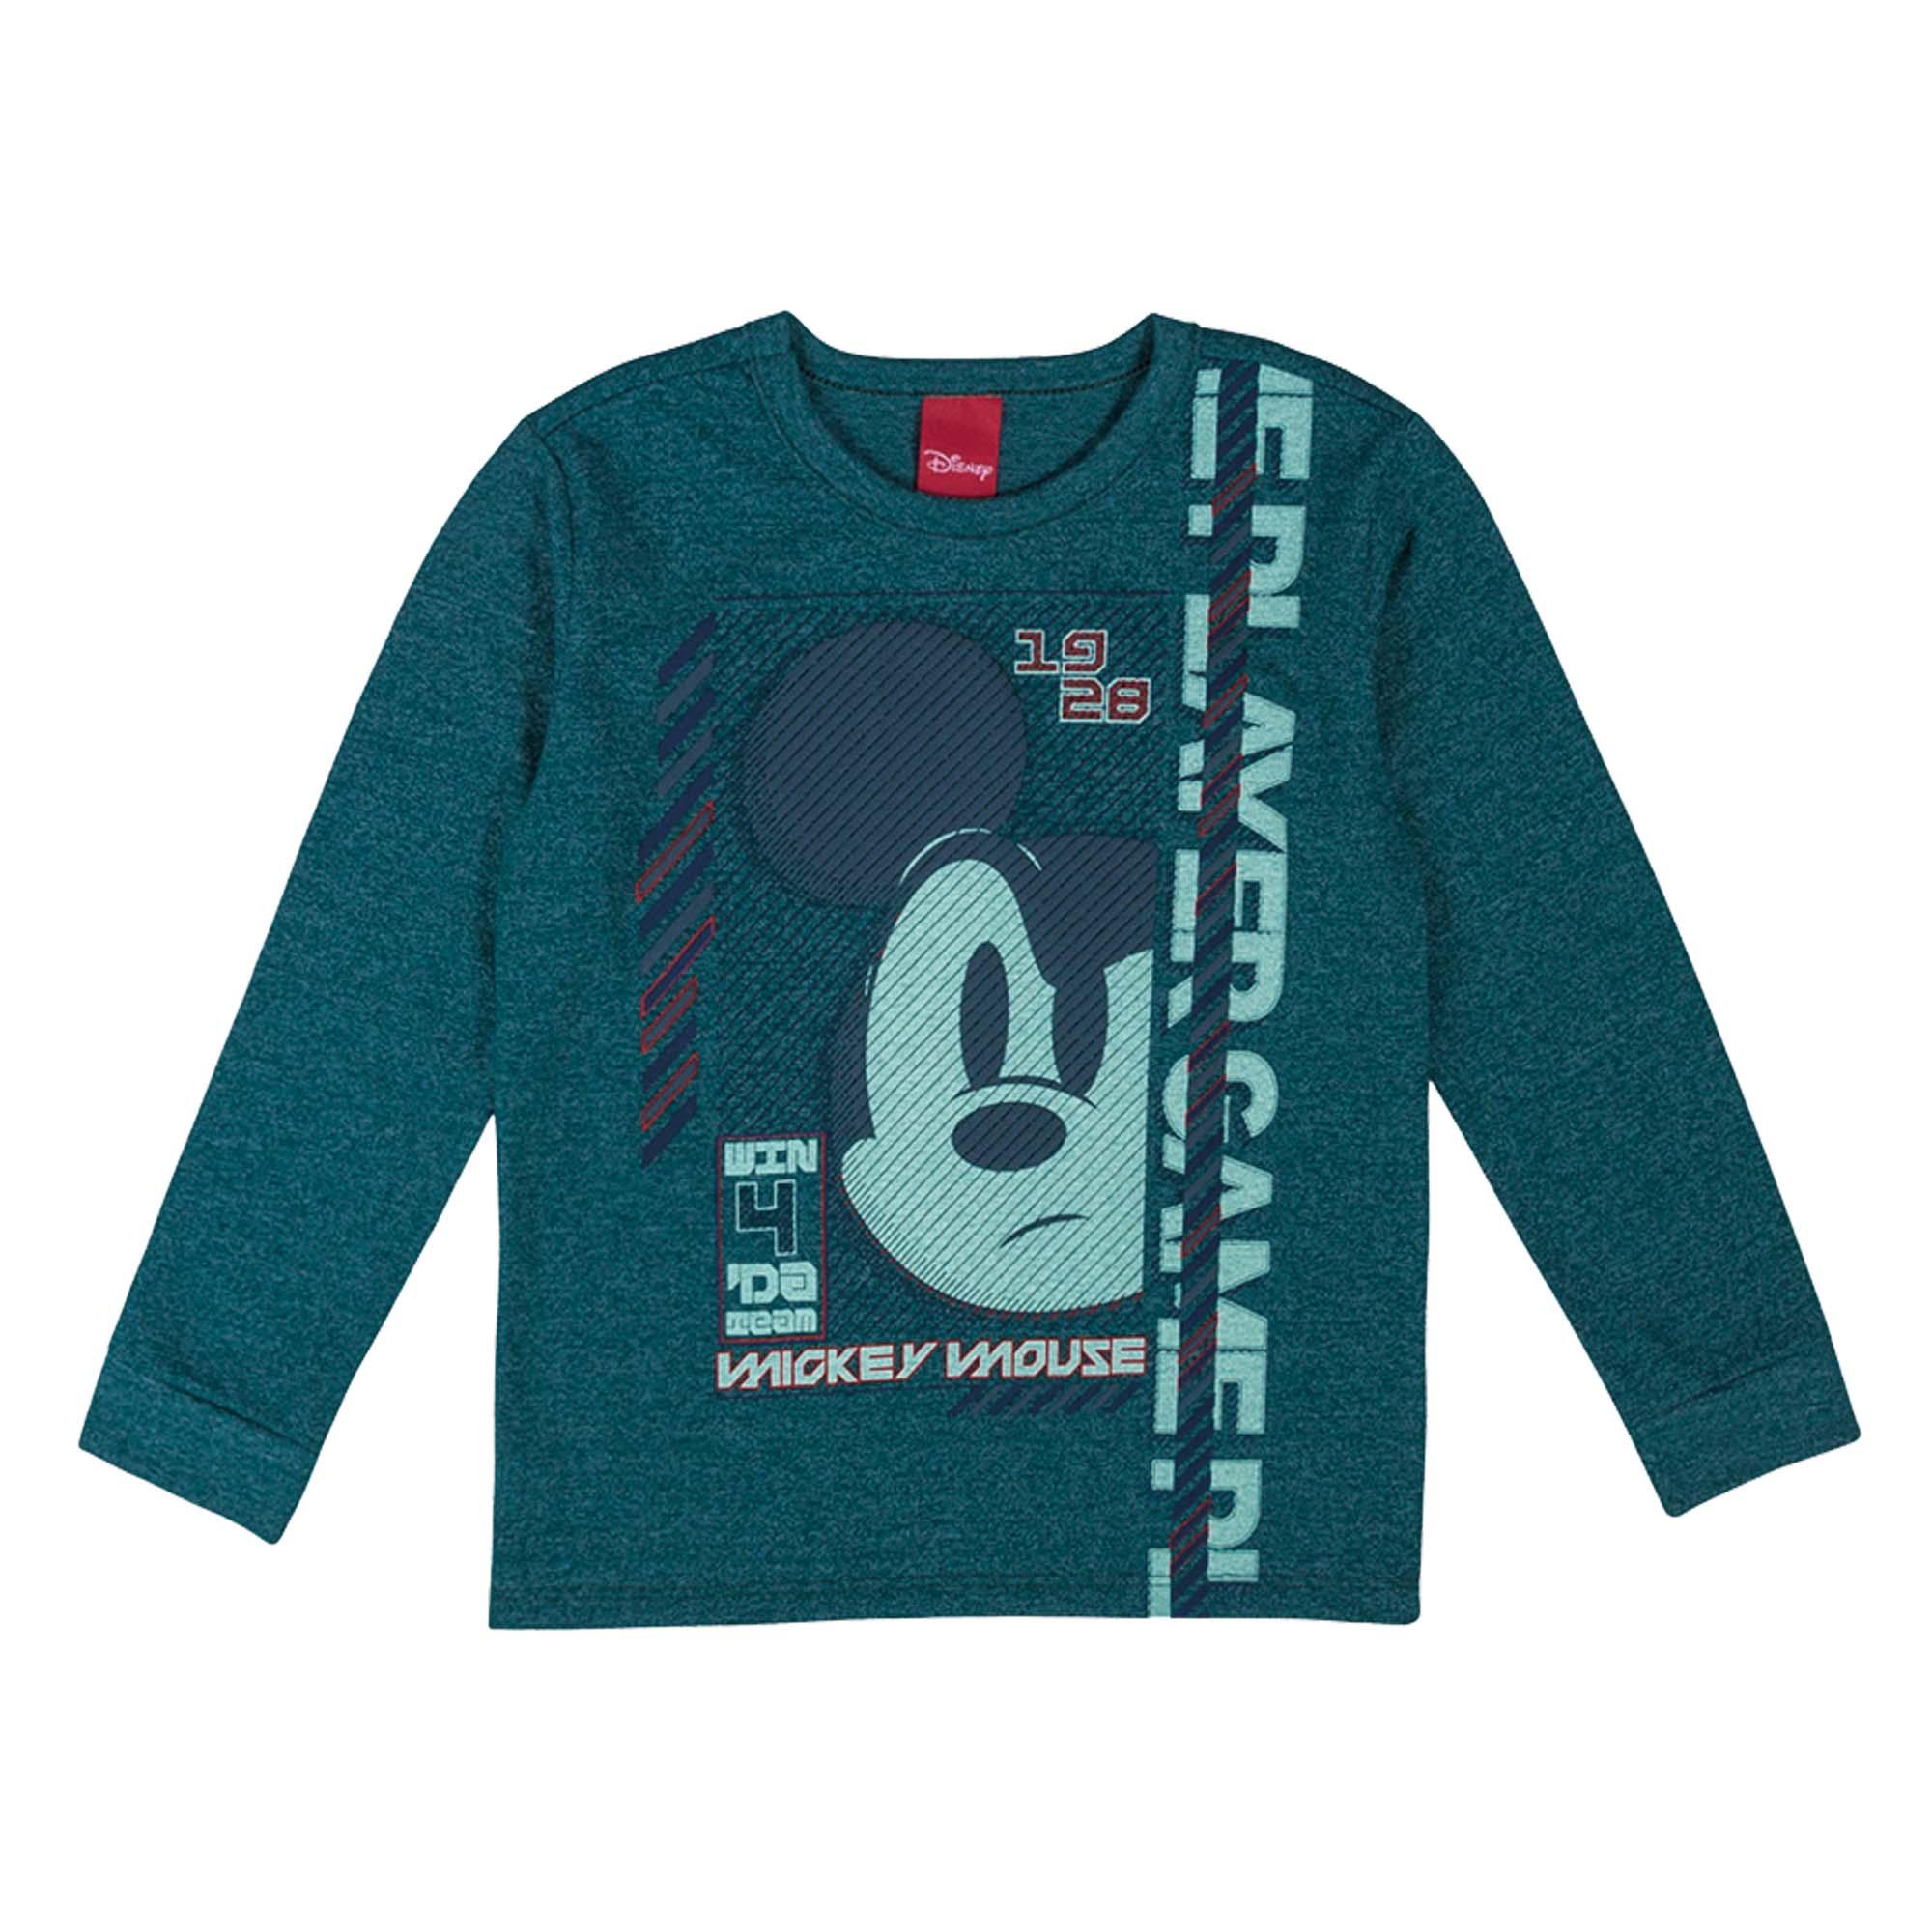 Camiseta Manga Longa Cativa Estampa Relevo Mickey Mouse Pensativo - 4 ao 10